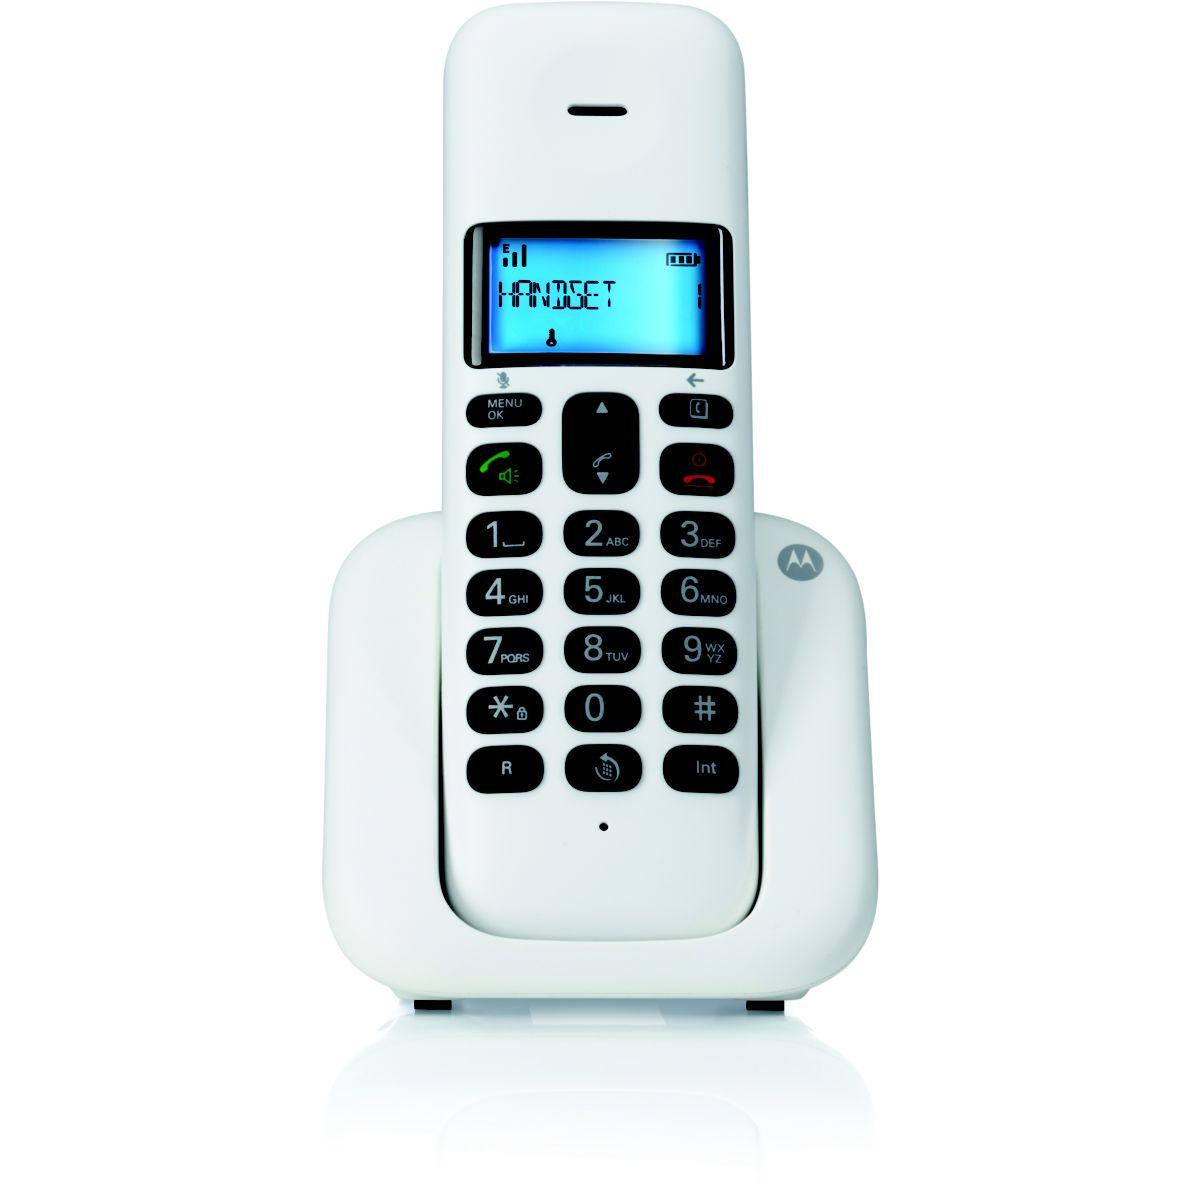 Téléphone motorola motorola t301 blanc - 15% de remise immédiate avec le code : multi15 (photo)